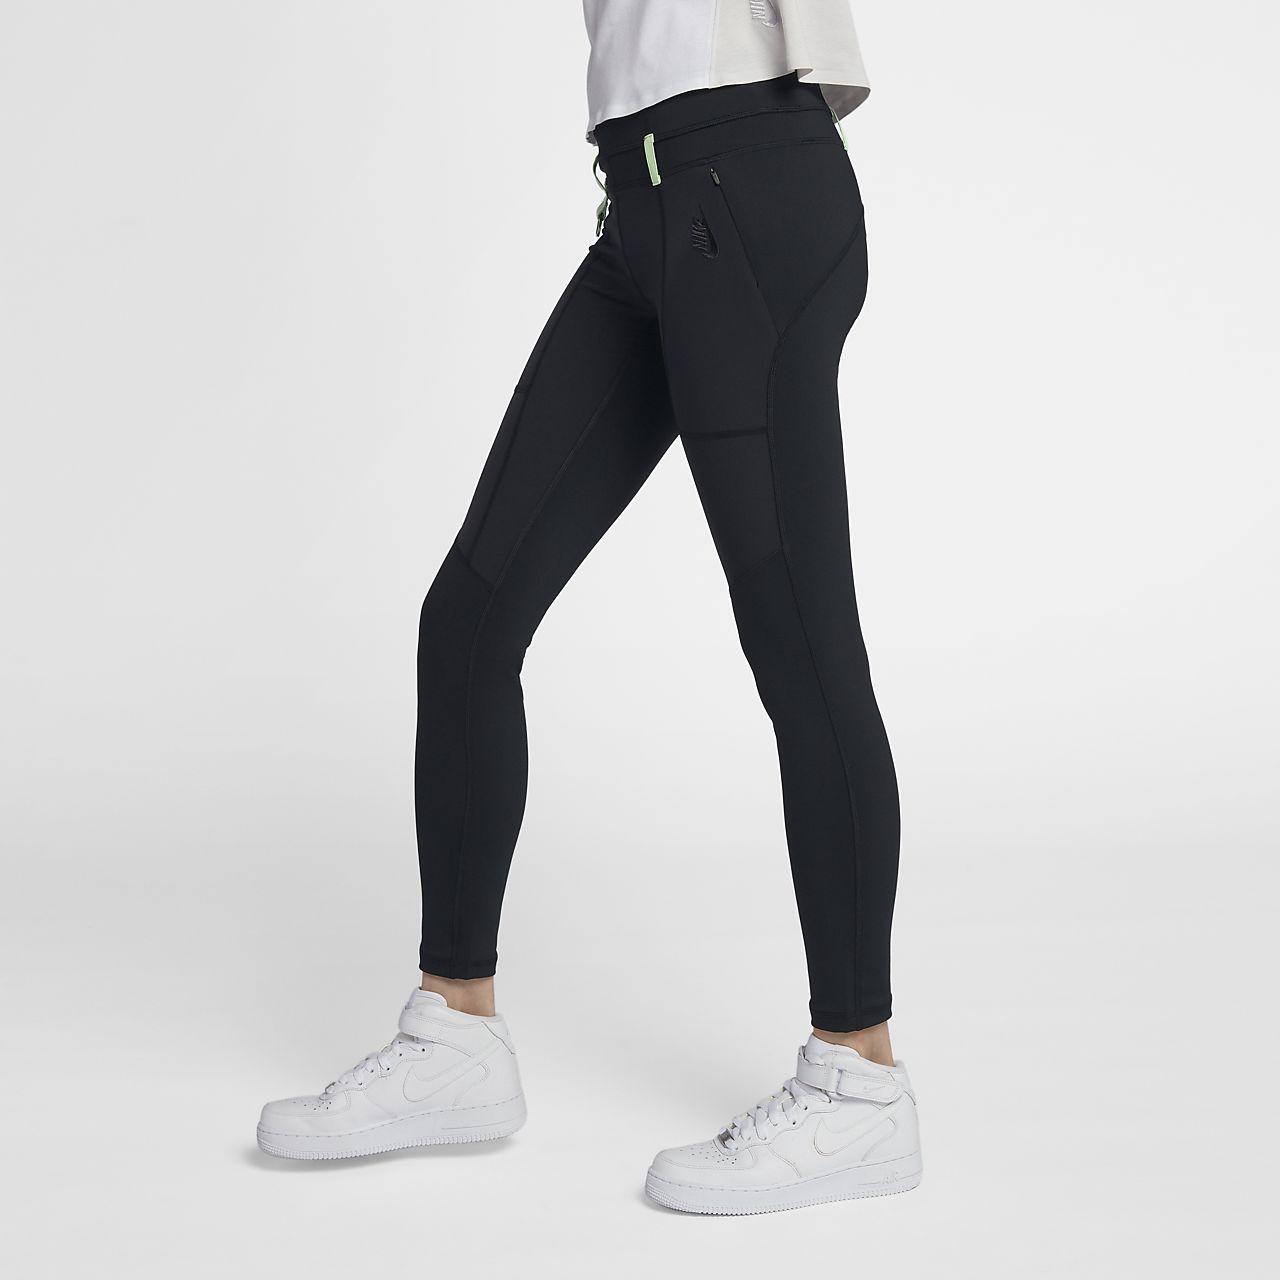 7ecd8ba75 Nike Women s Mid-Rise Tights. Nike.com